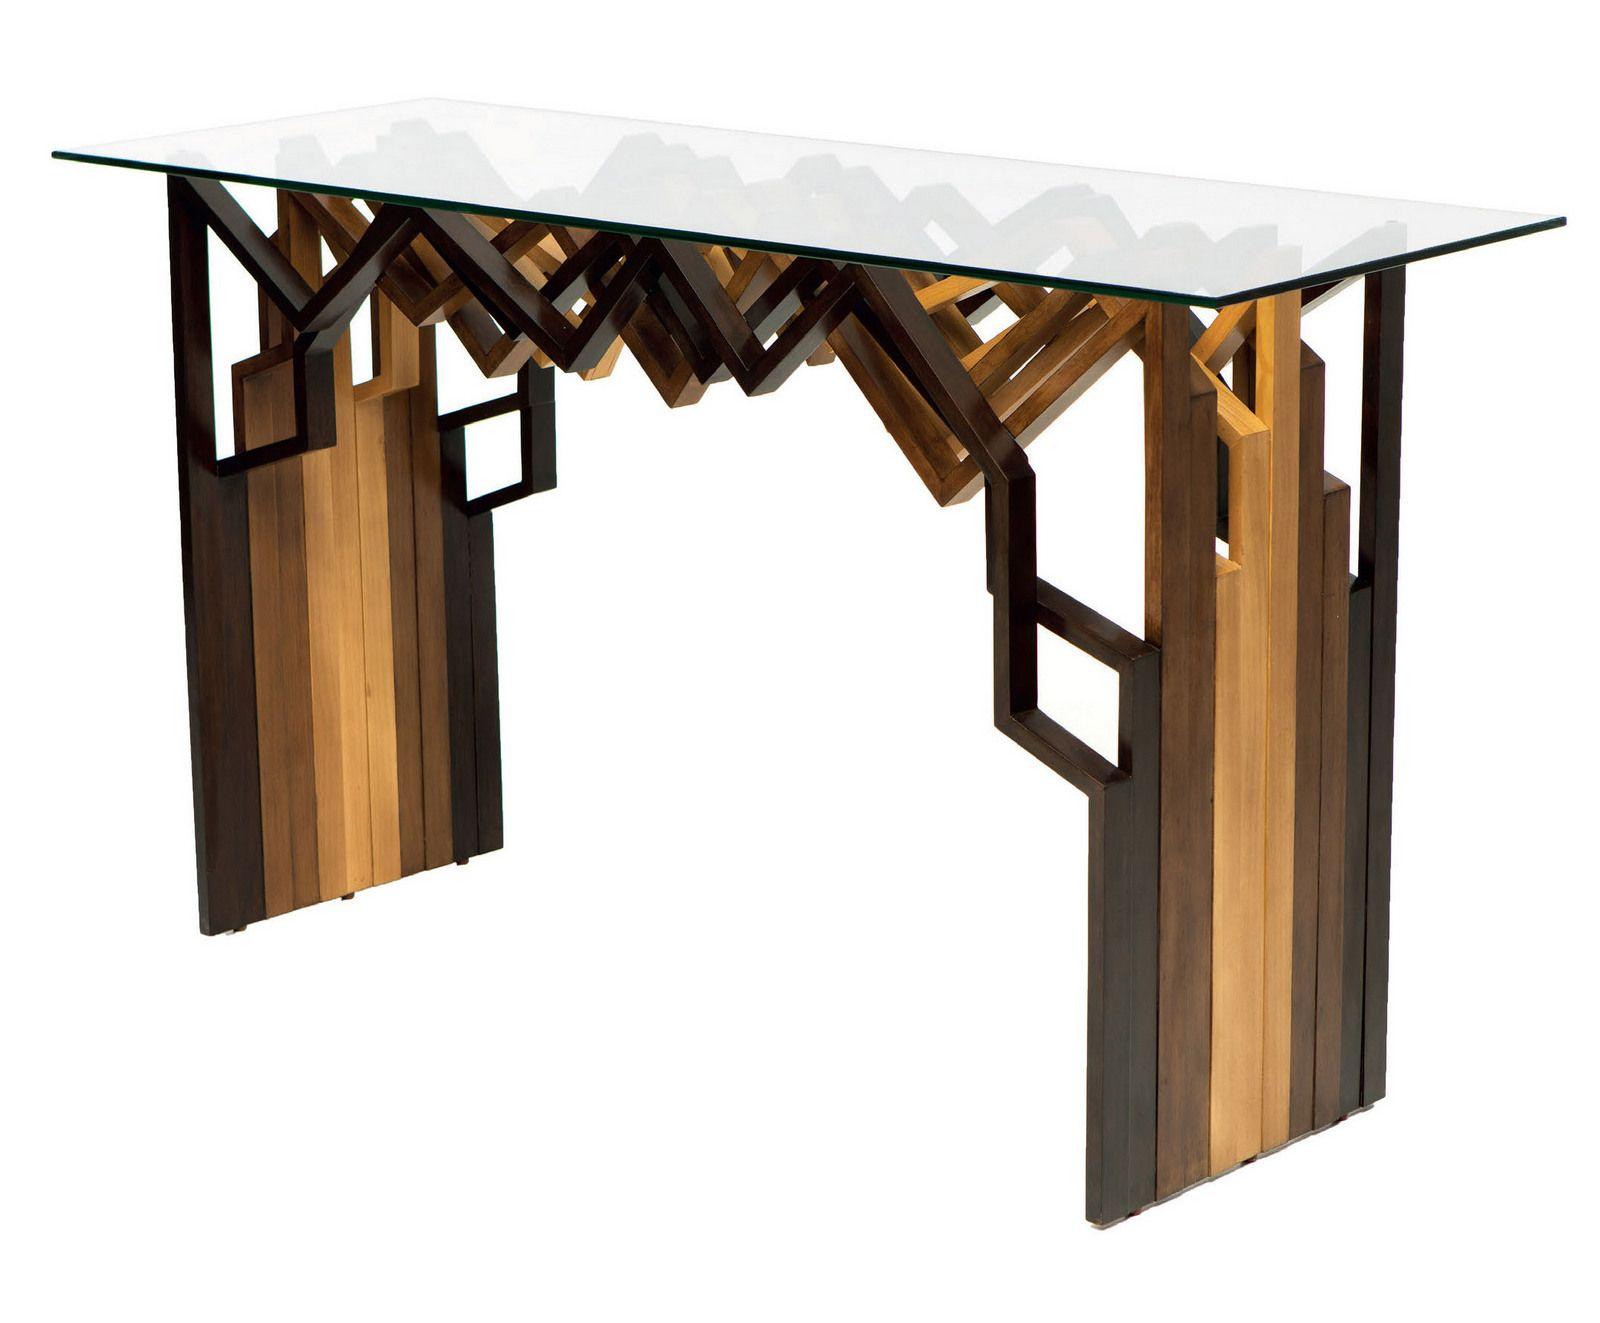 Zagi Console Table by Vito Selma